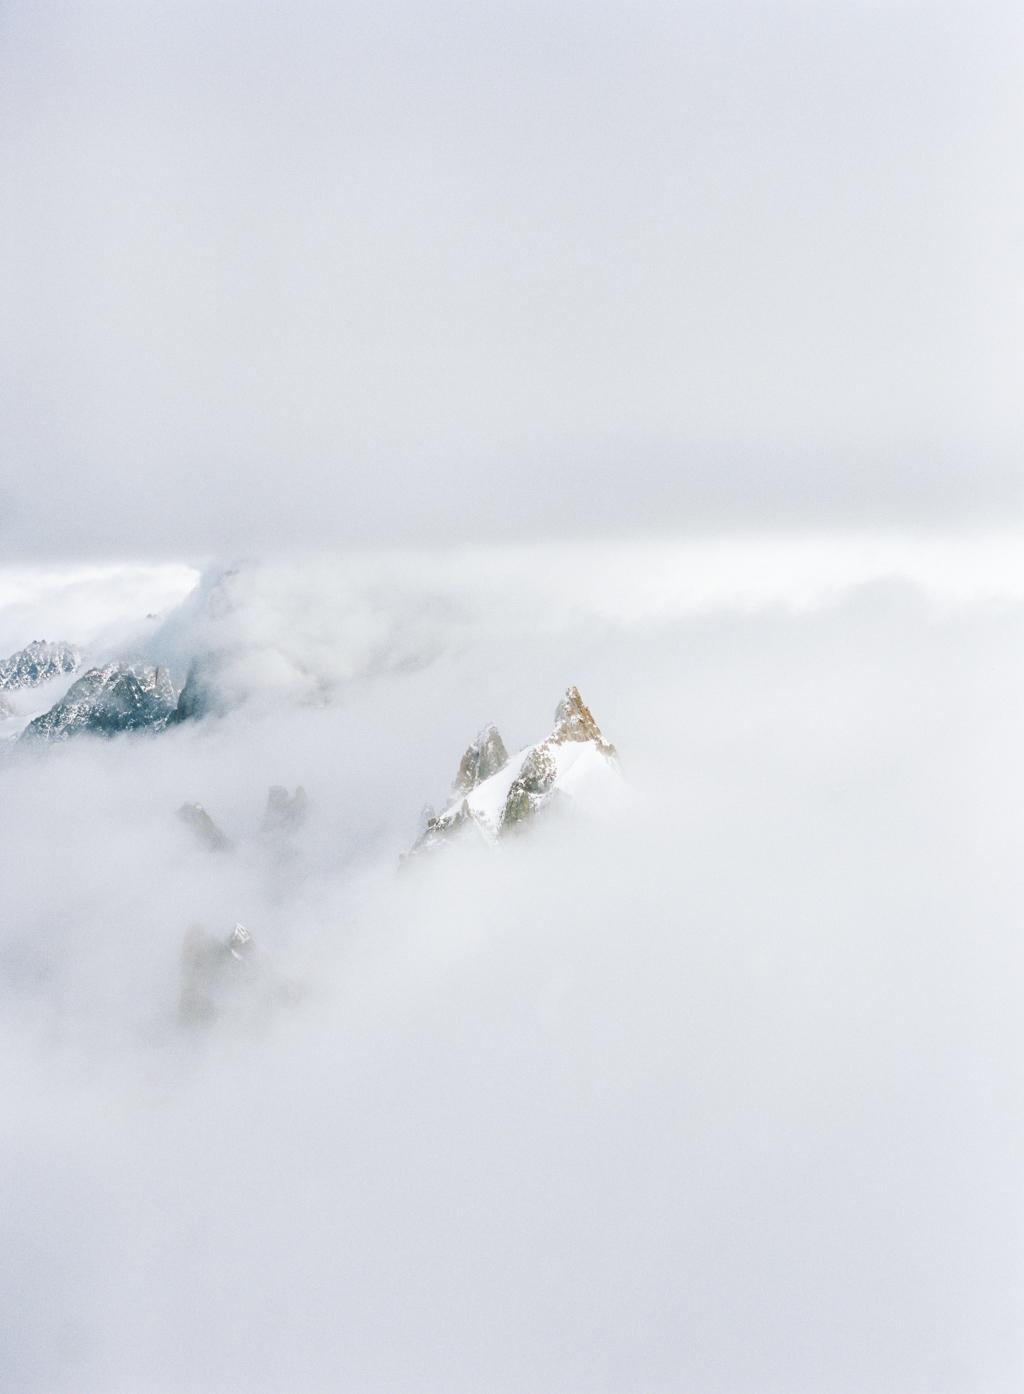 capyture-photographe-alsace-haut-rhin-27